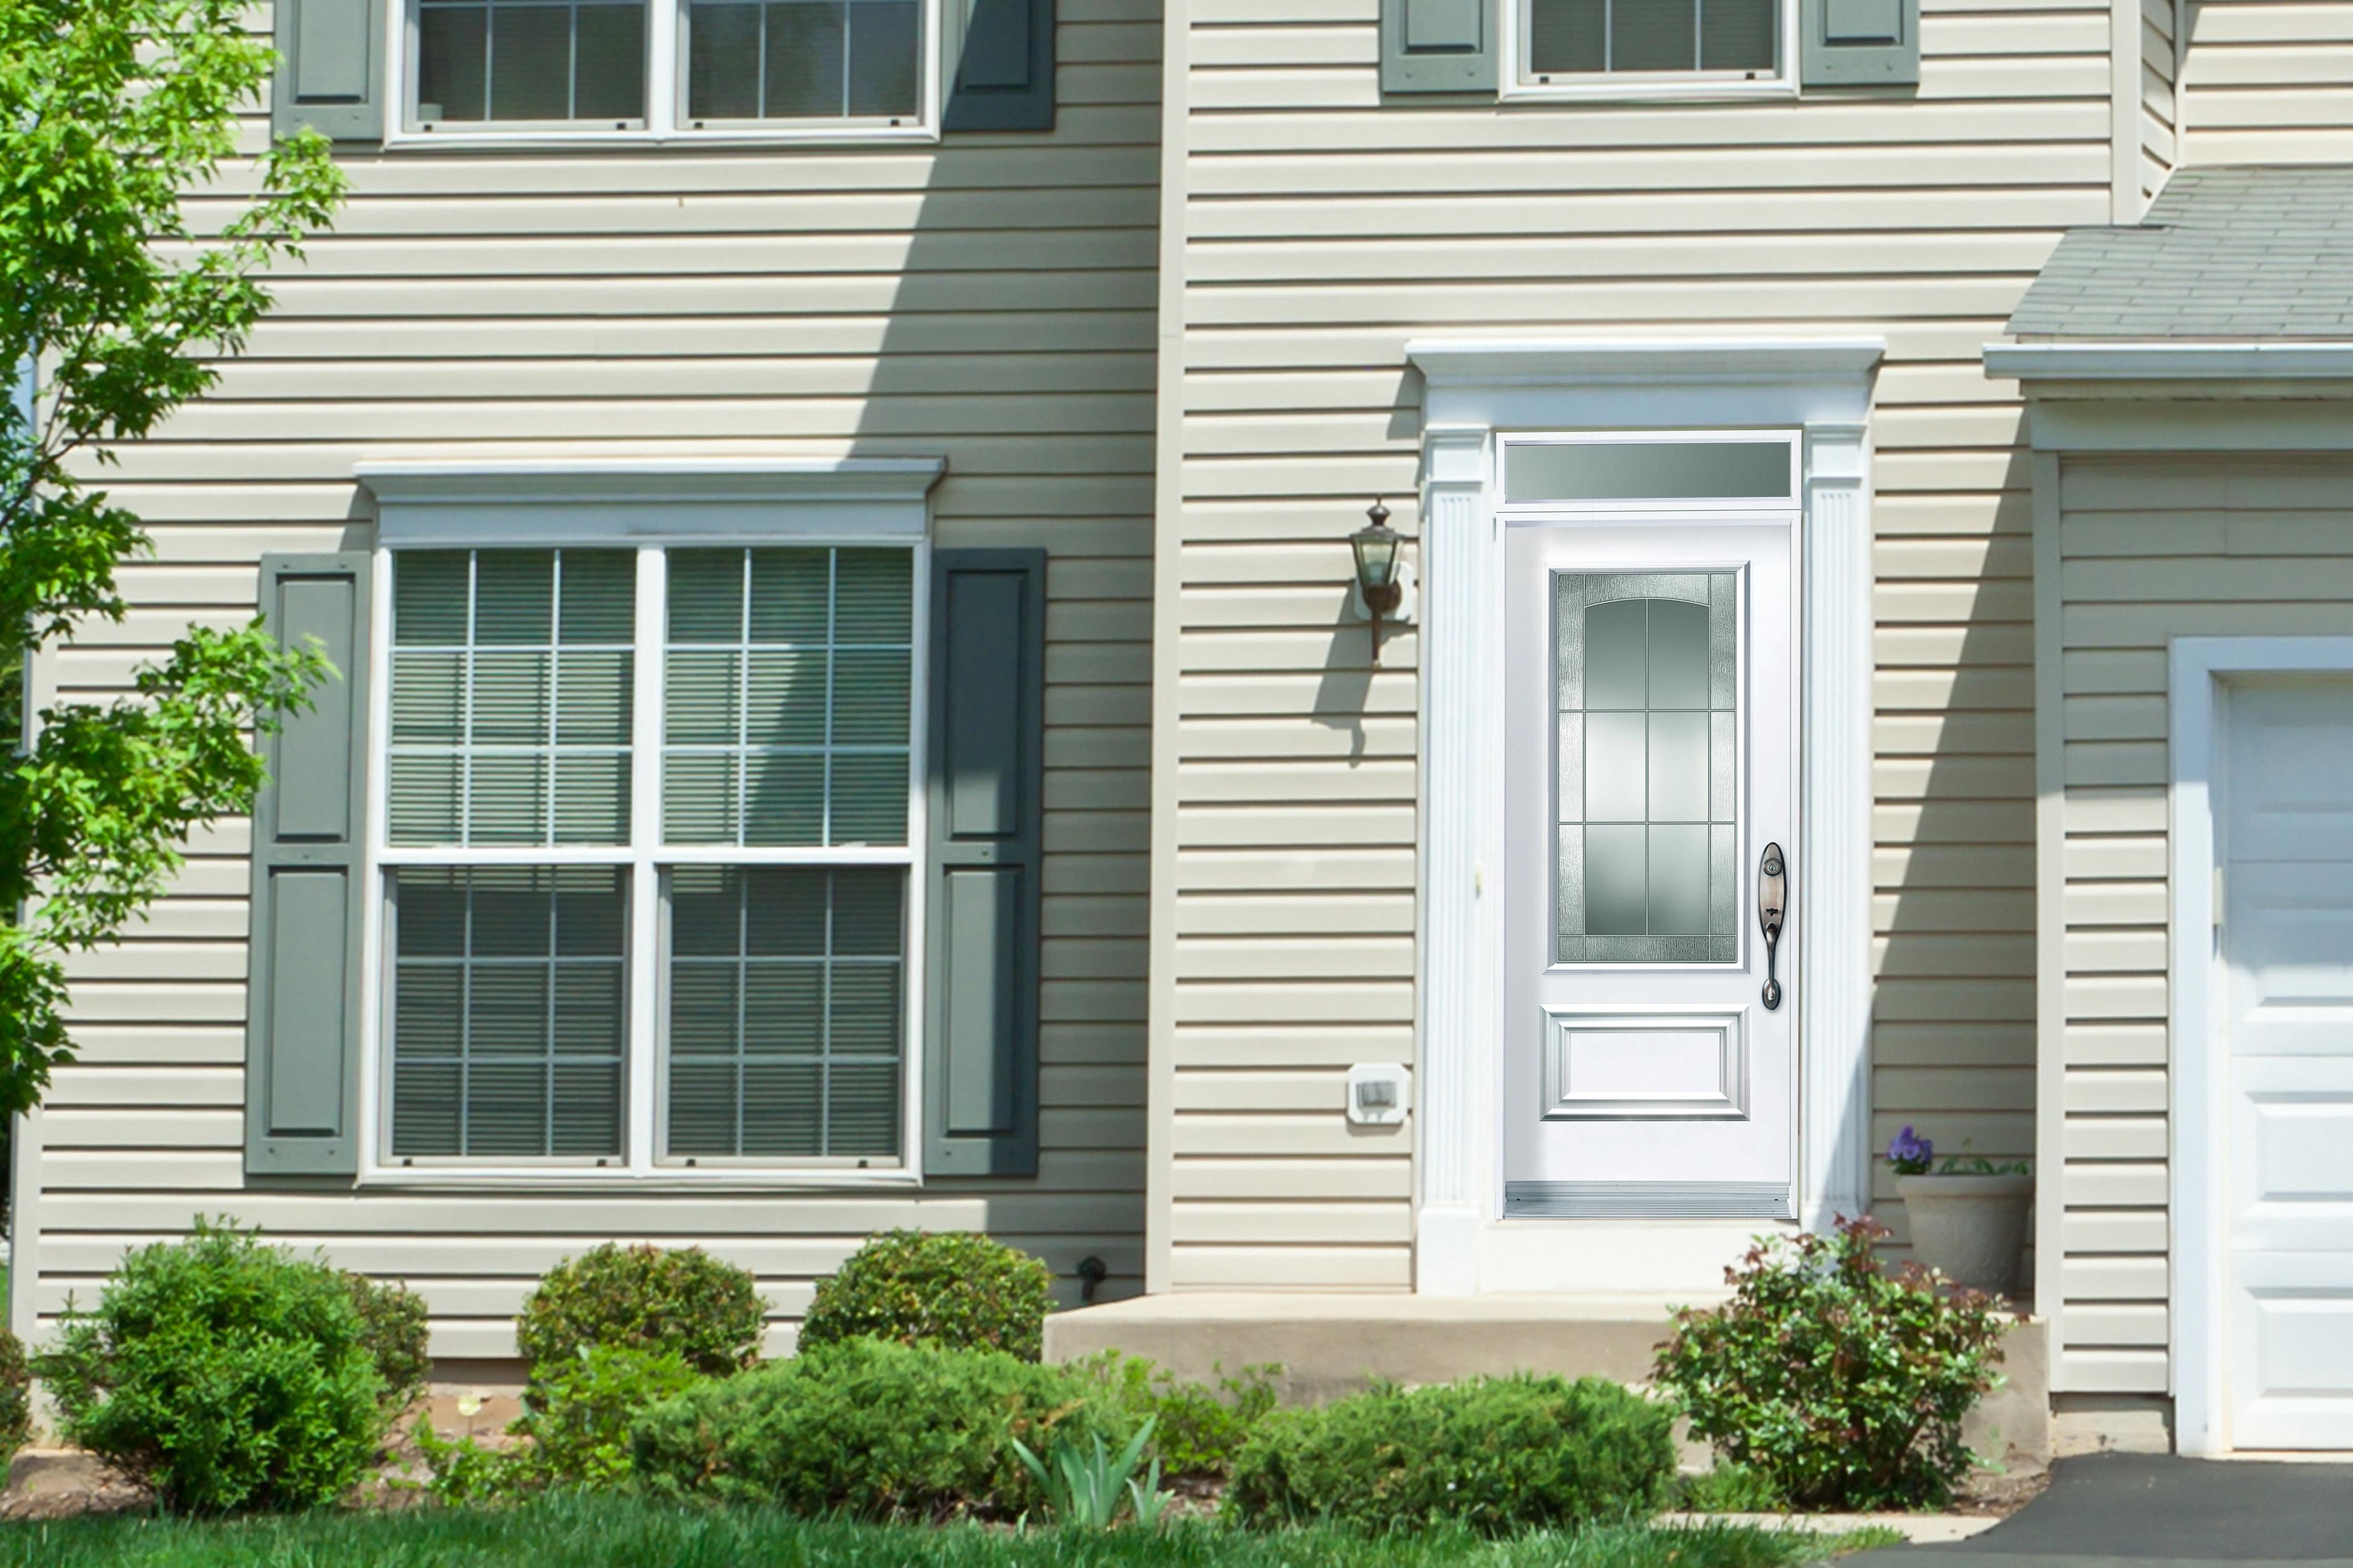 porte simple imposte rectangle portatec fabricant de porte d 39 entr e sur mesure. Black Bedroom Furniture Sets. Home Design Ideas